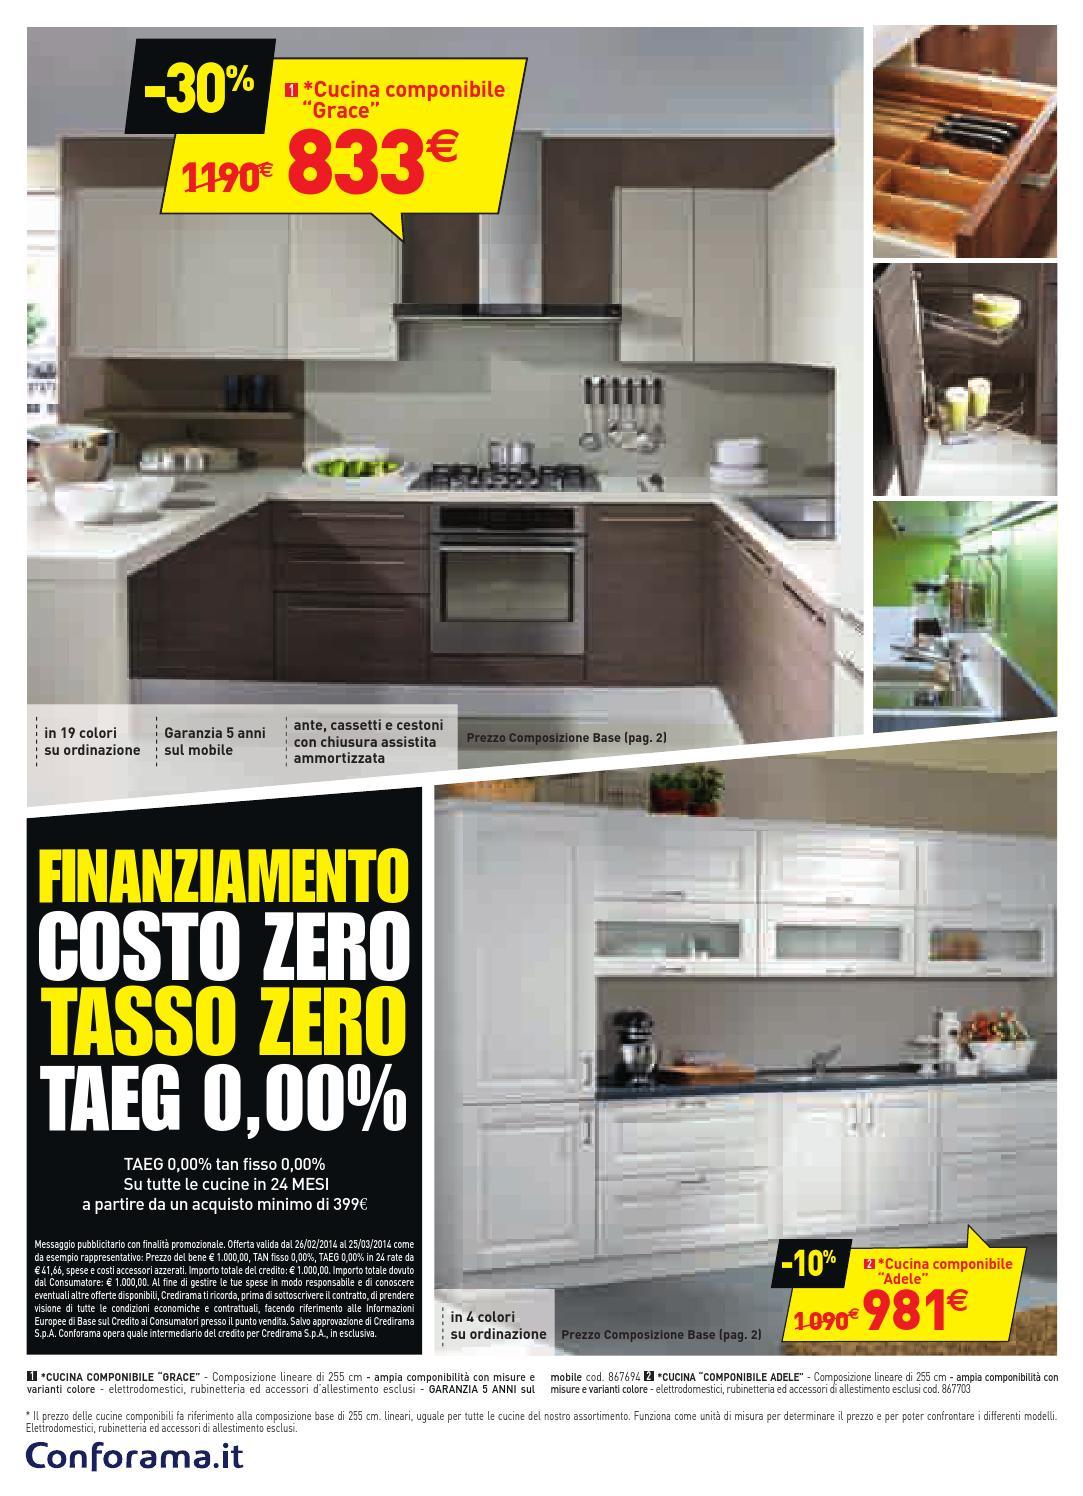 Conforama cucina che passione by Mobilpro - issuu